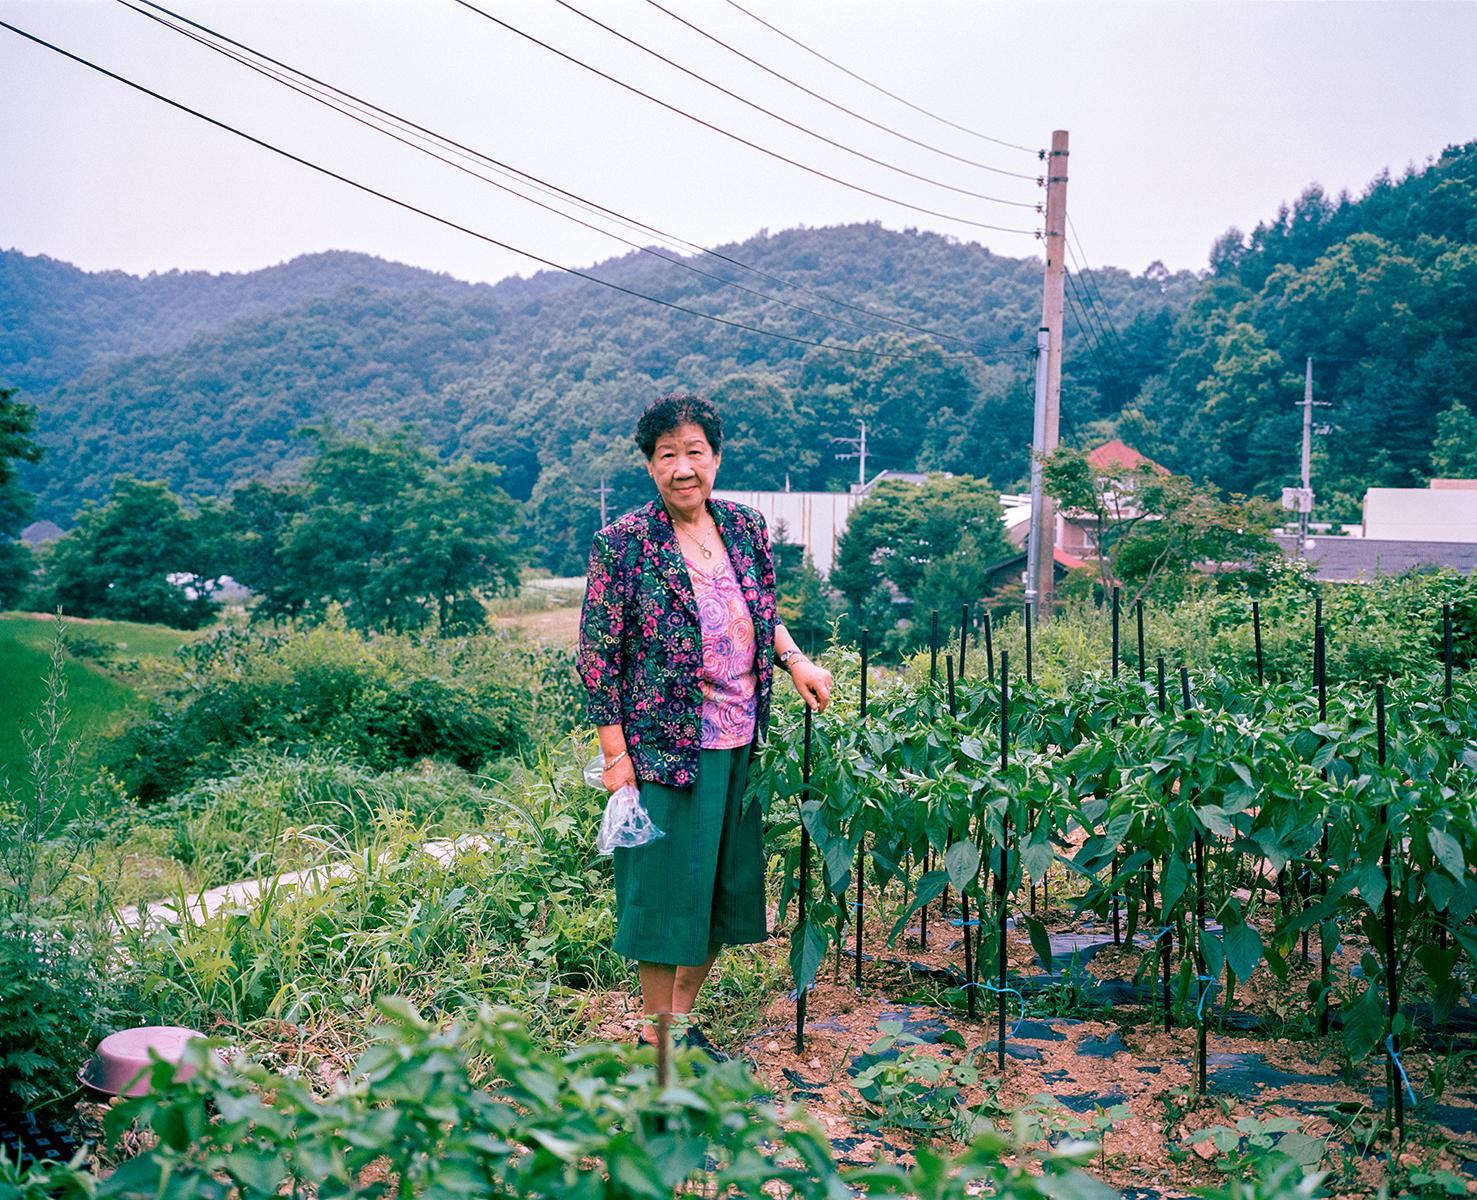 Kang Il Chul Halmoni in her garden, House of Sharing, Gwangju, South Korea, 2010